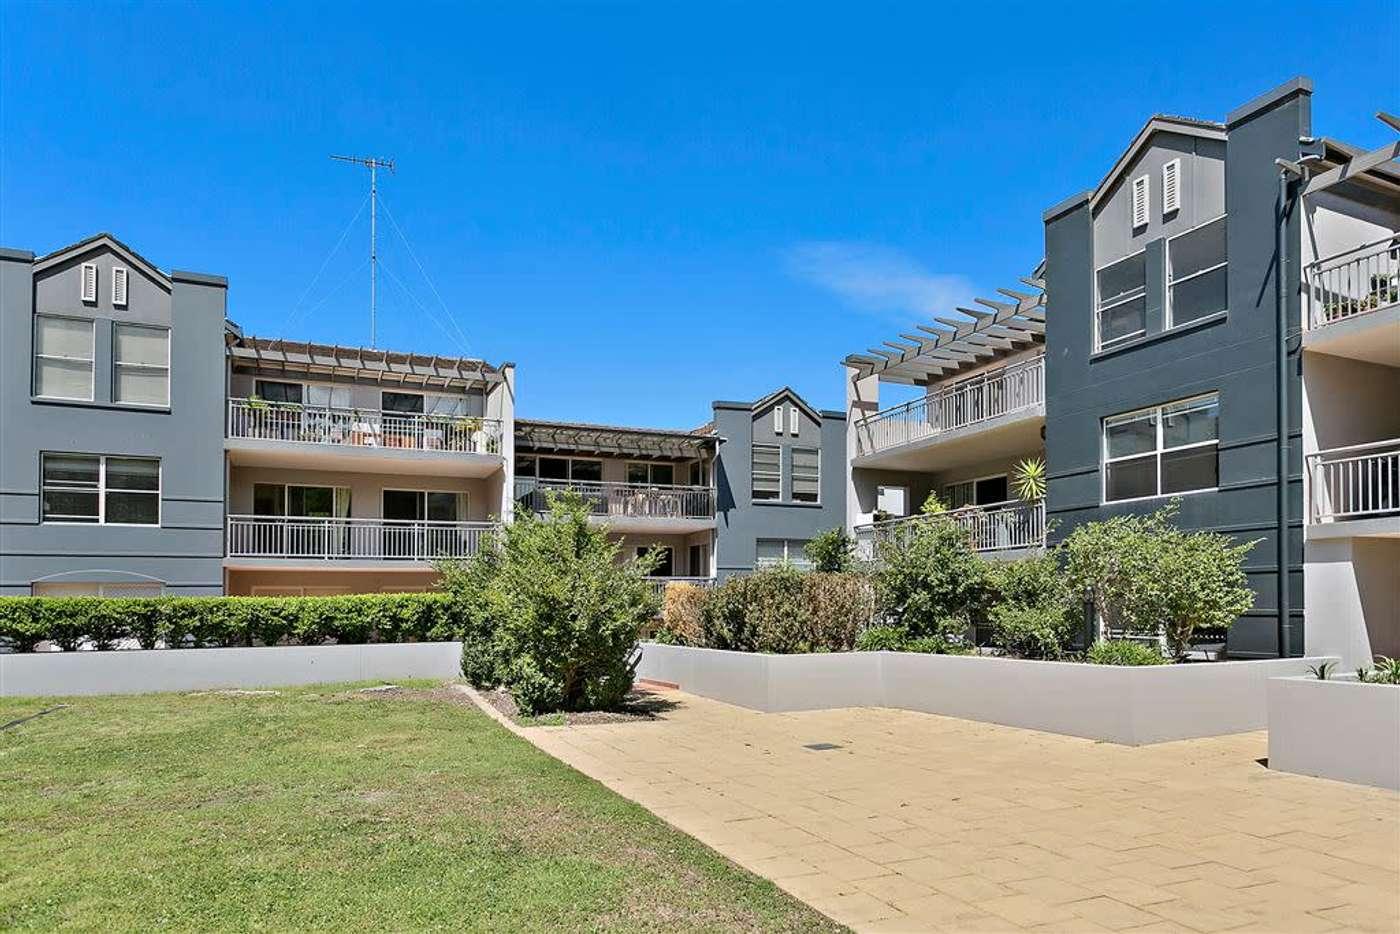 Main view of Homely unit listing, 13/118 Karimbla Road, Miranda NSW 2228